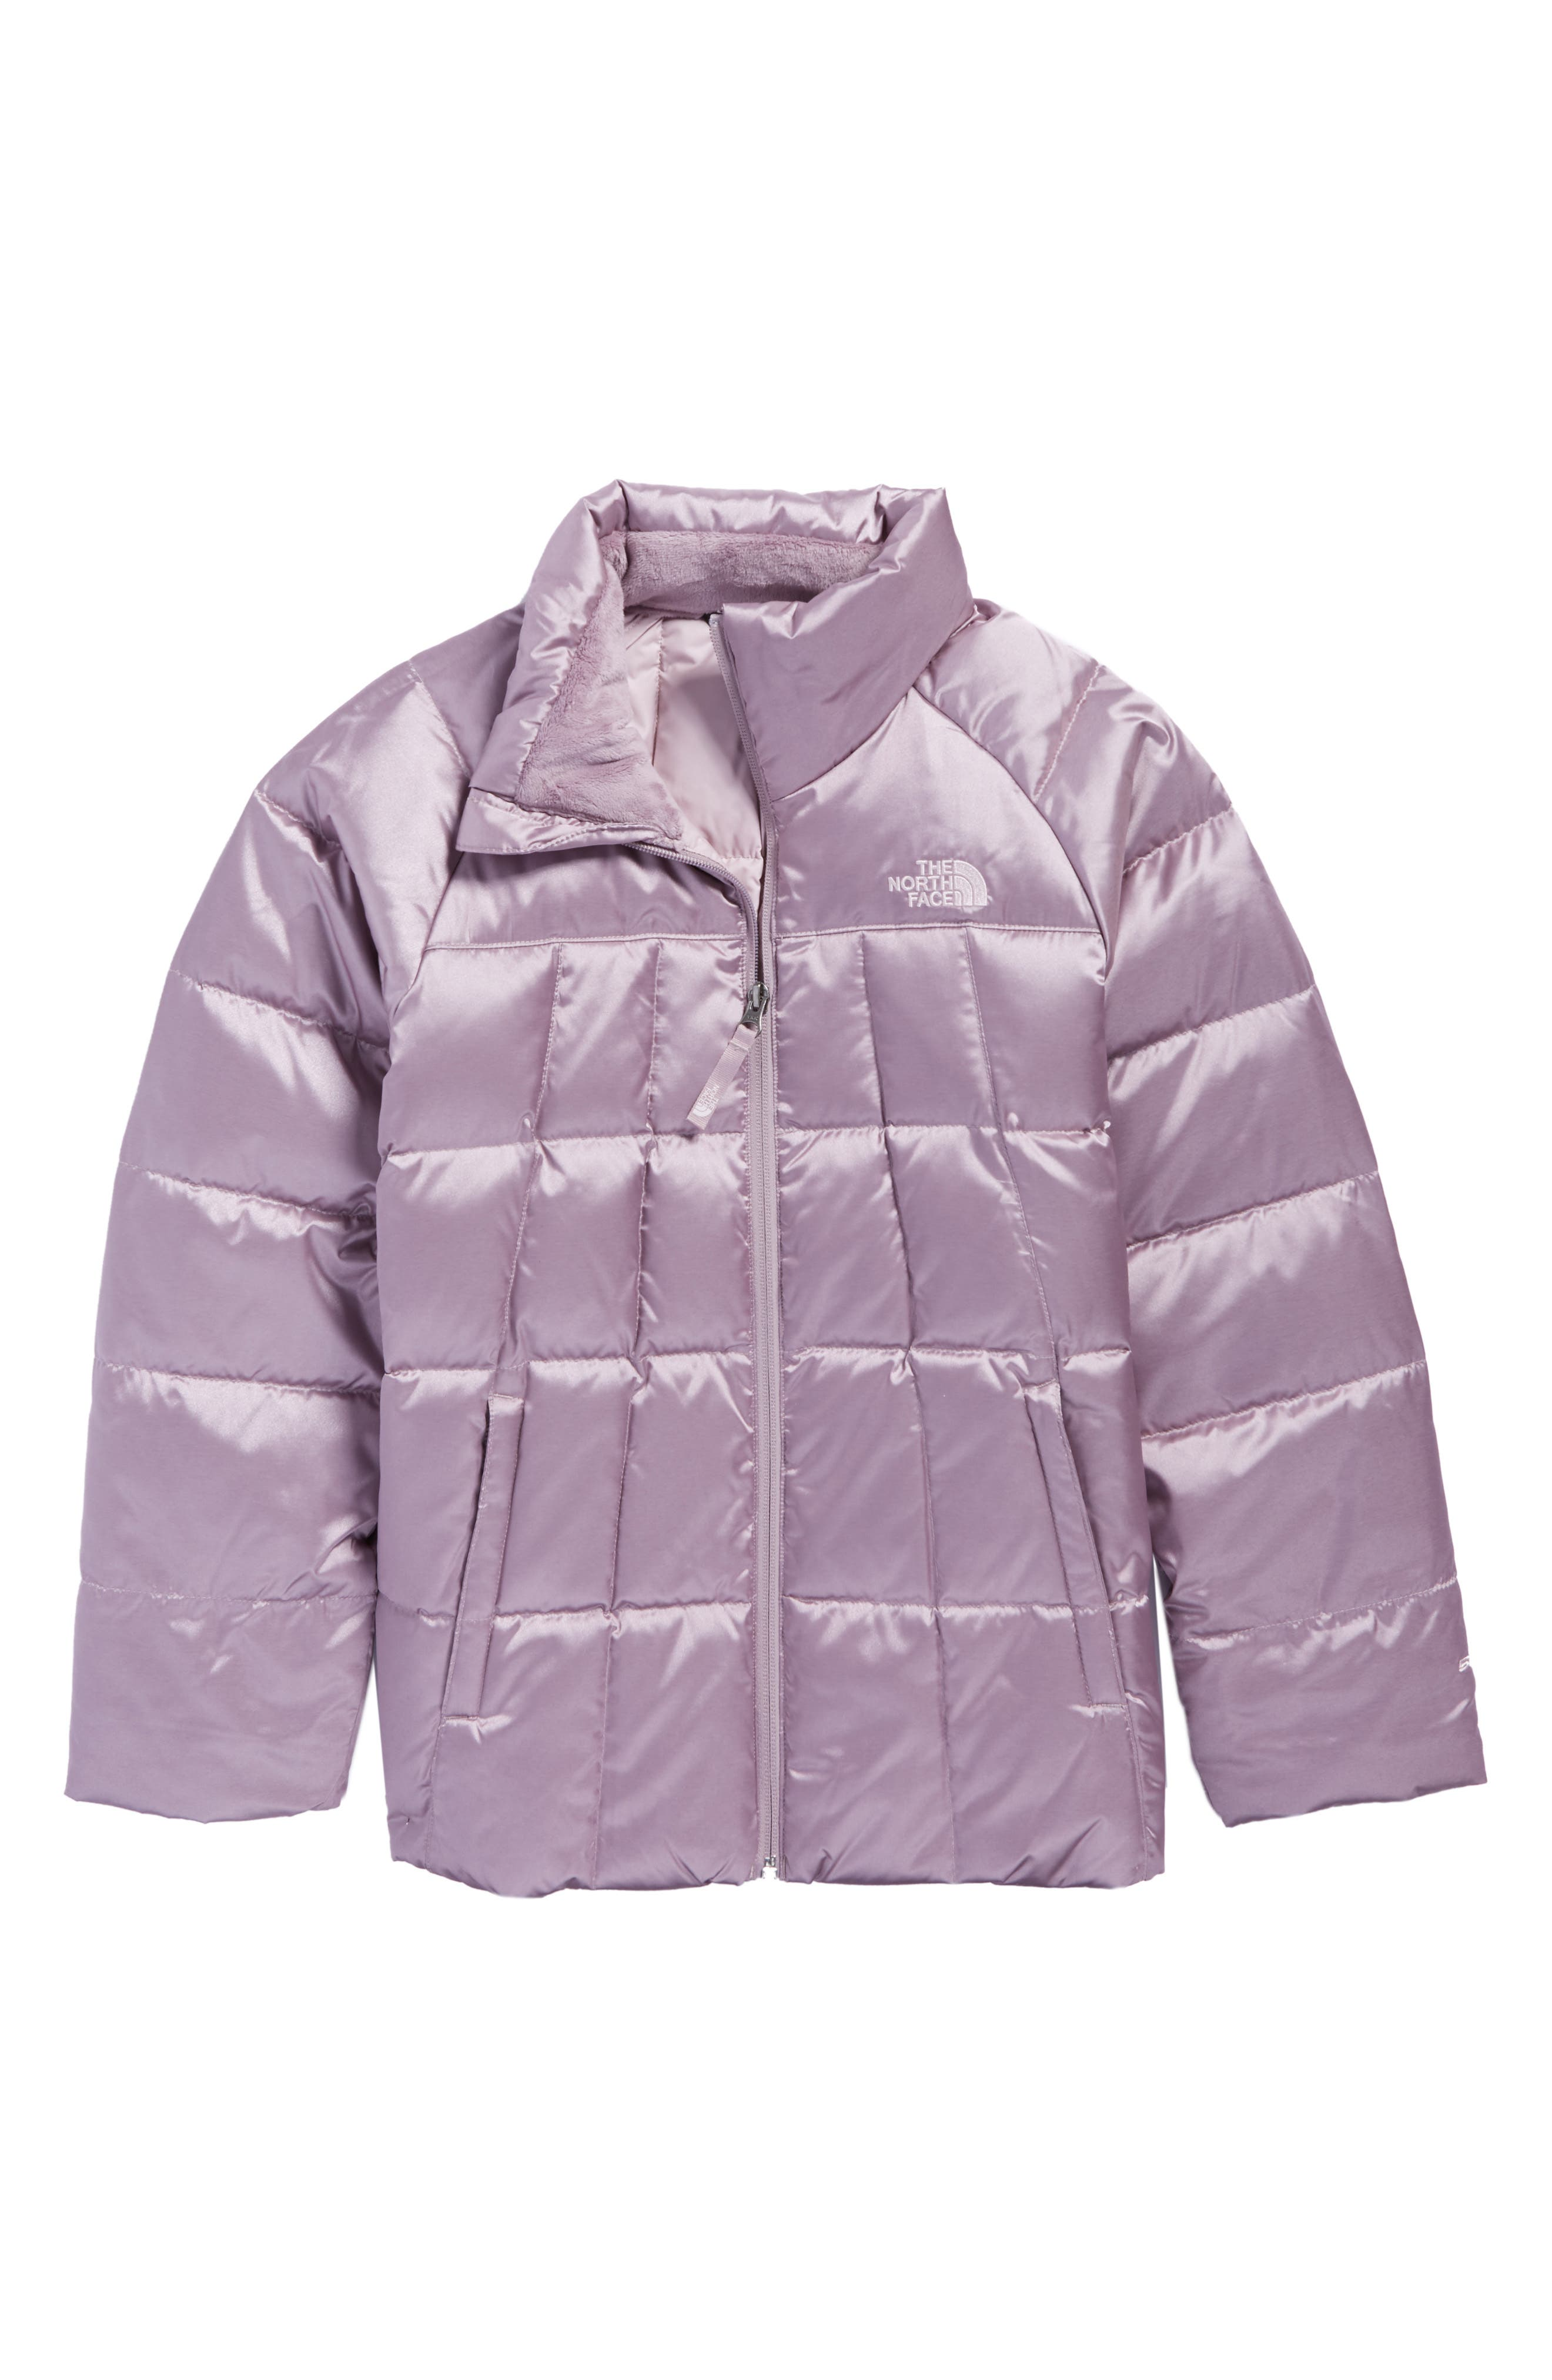 Aconcagua Down Jacket,                             Main thumbnail 1, color,                             Quail Grey